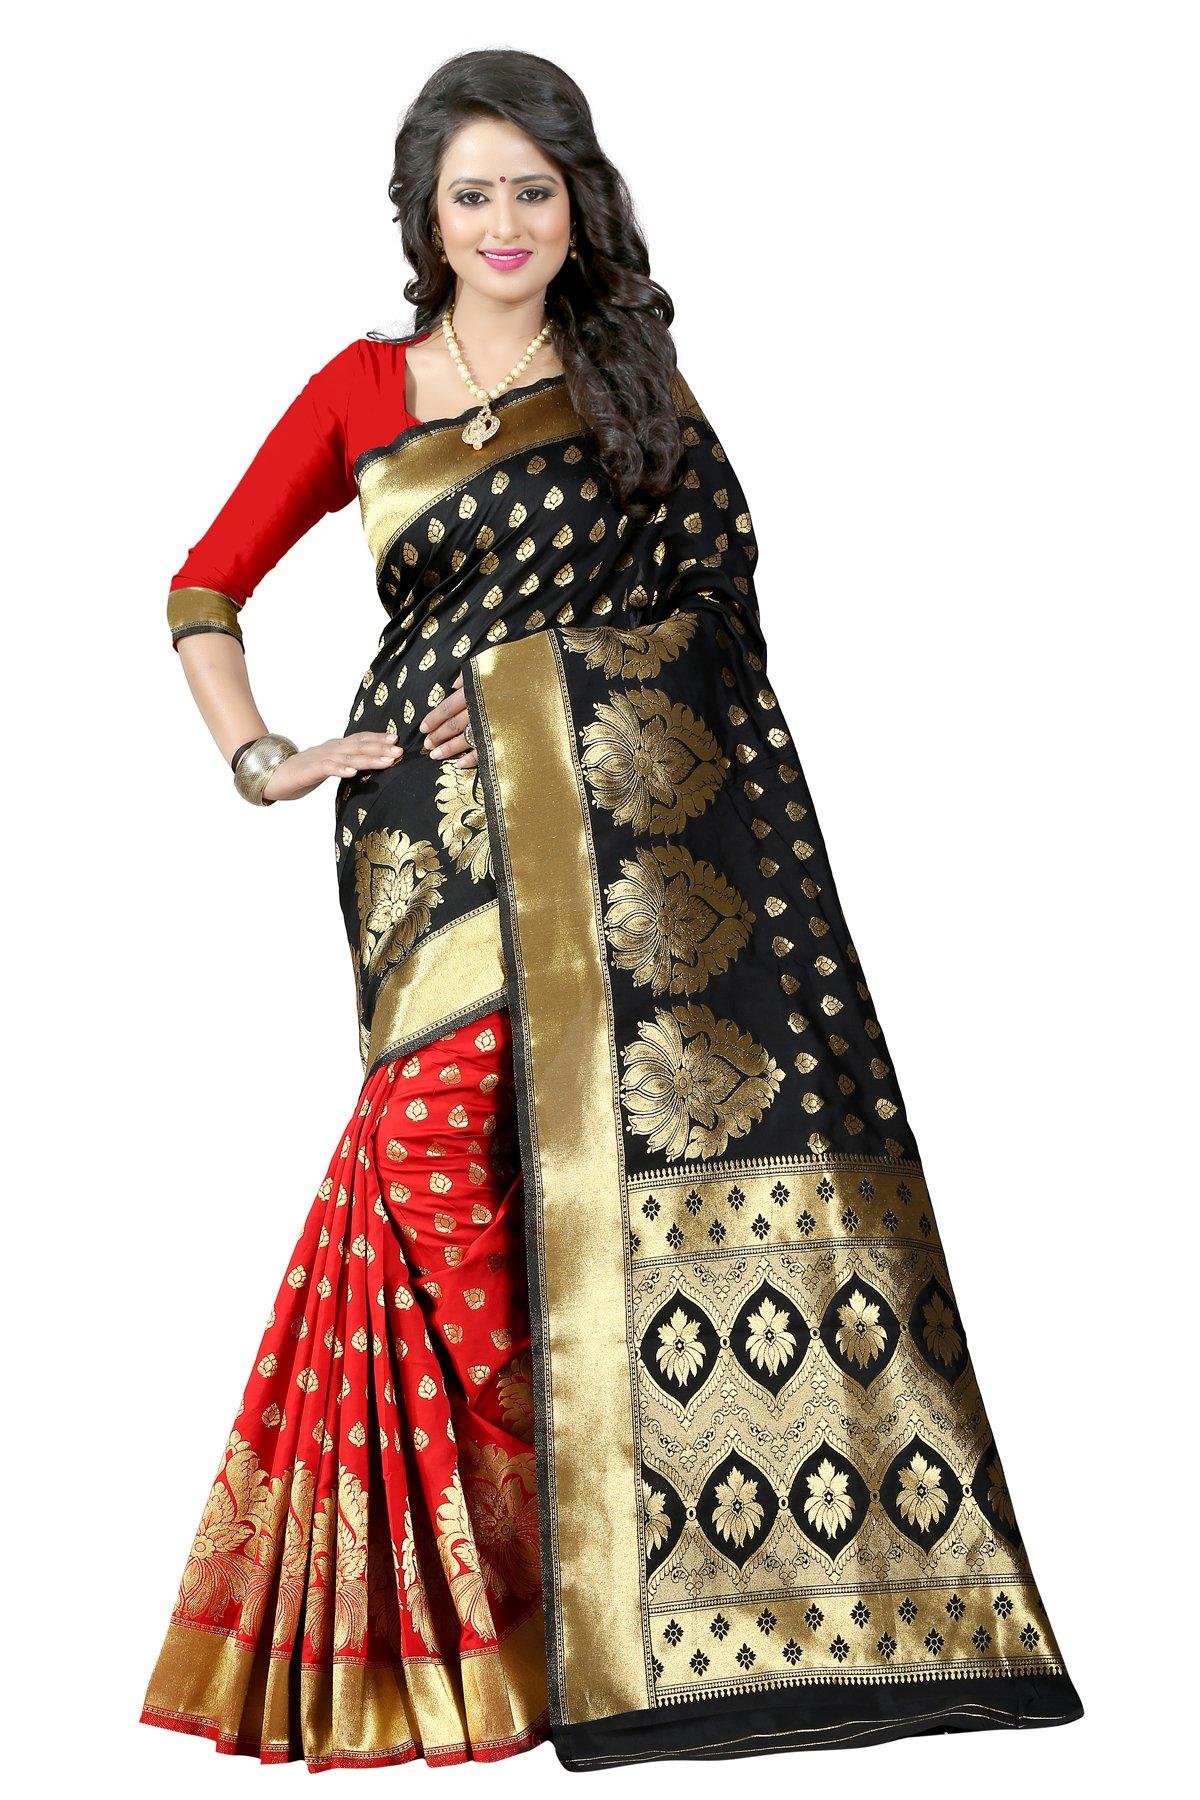 New indian/pakistani Ethnic Designer Multi Color Banarasi Silk Party Wedding Saree 750 (Black & red)